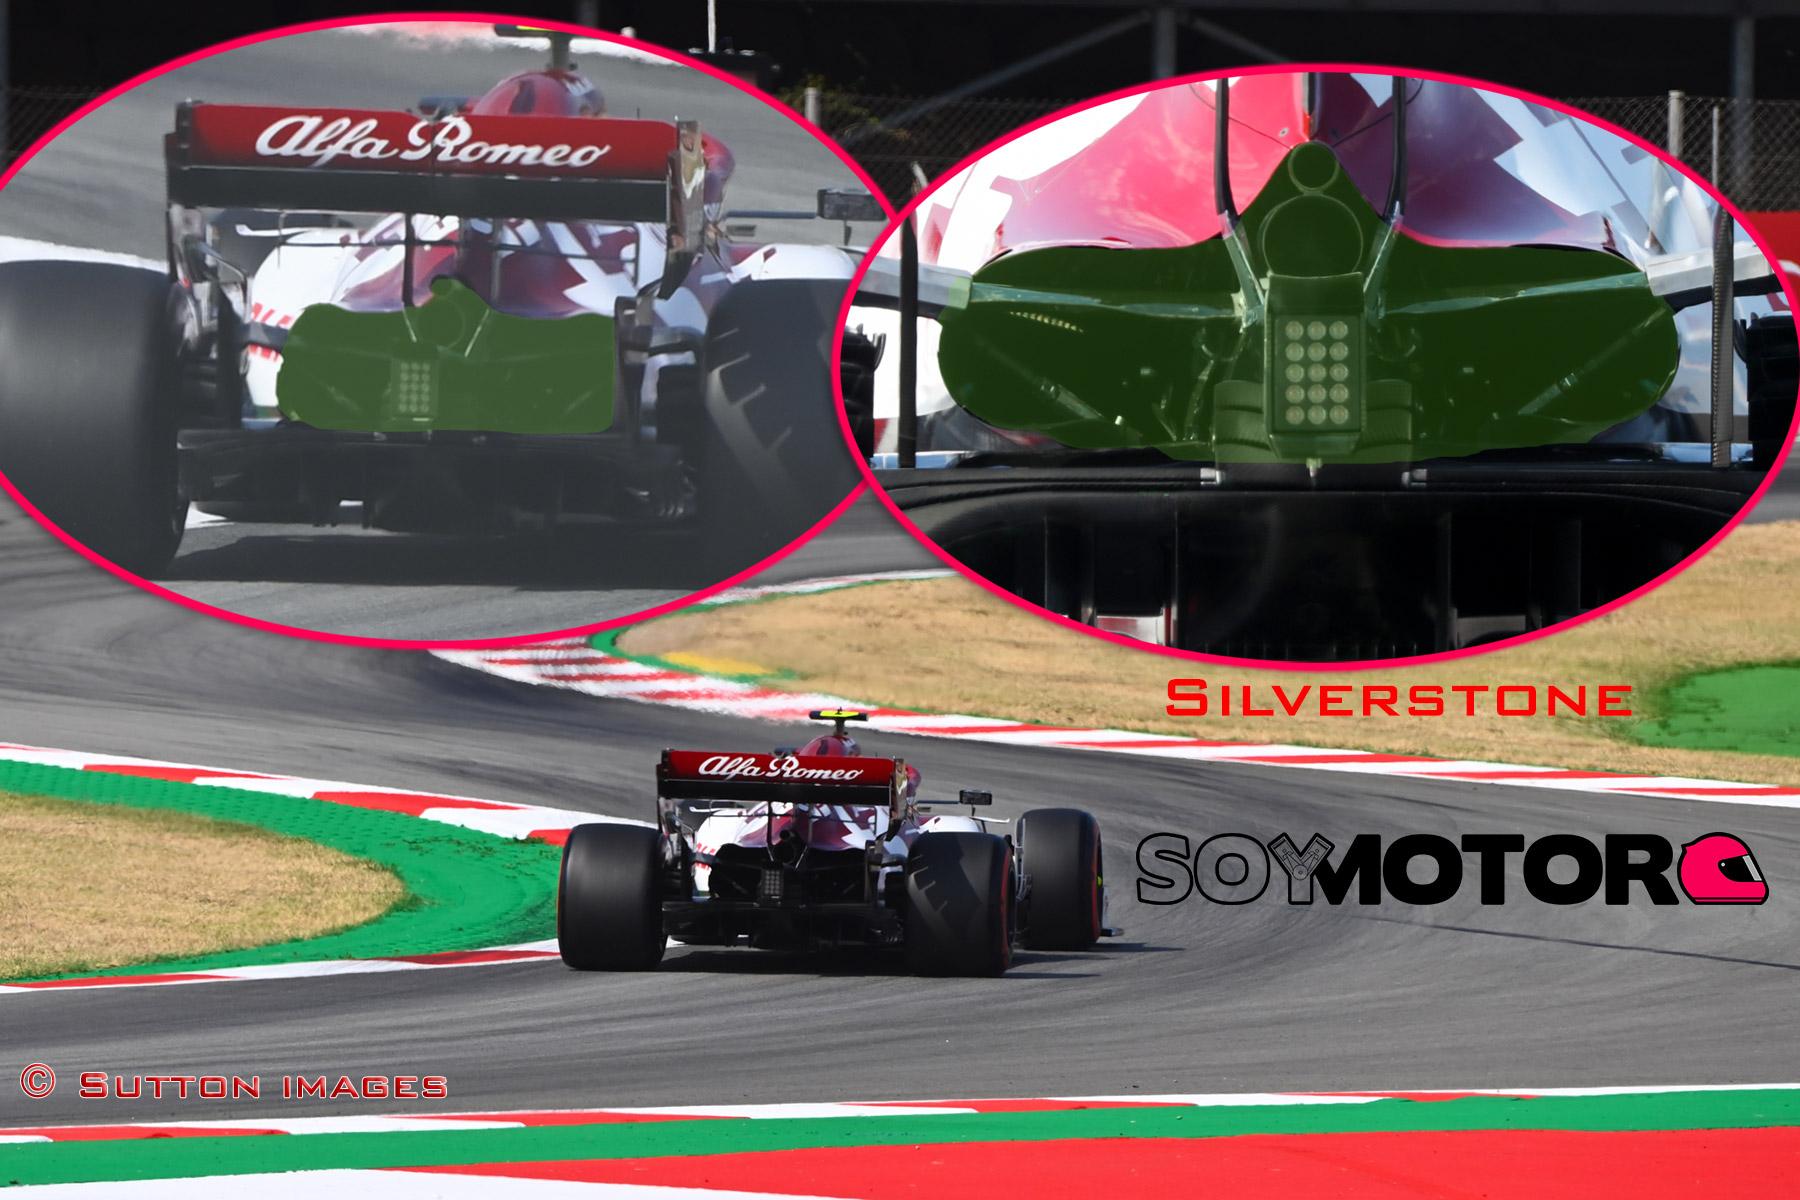 alfa-romeo-salida-posterior-soymotor_1.jpg